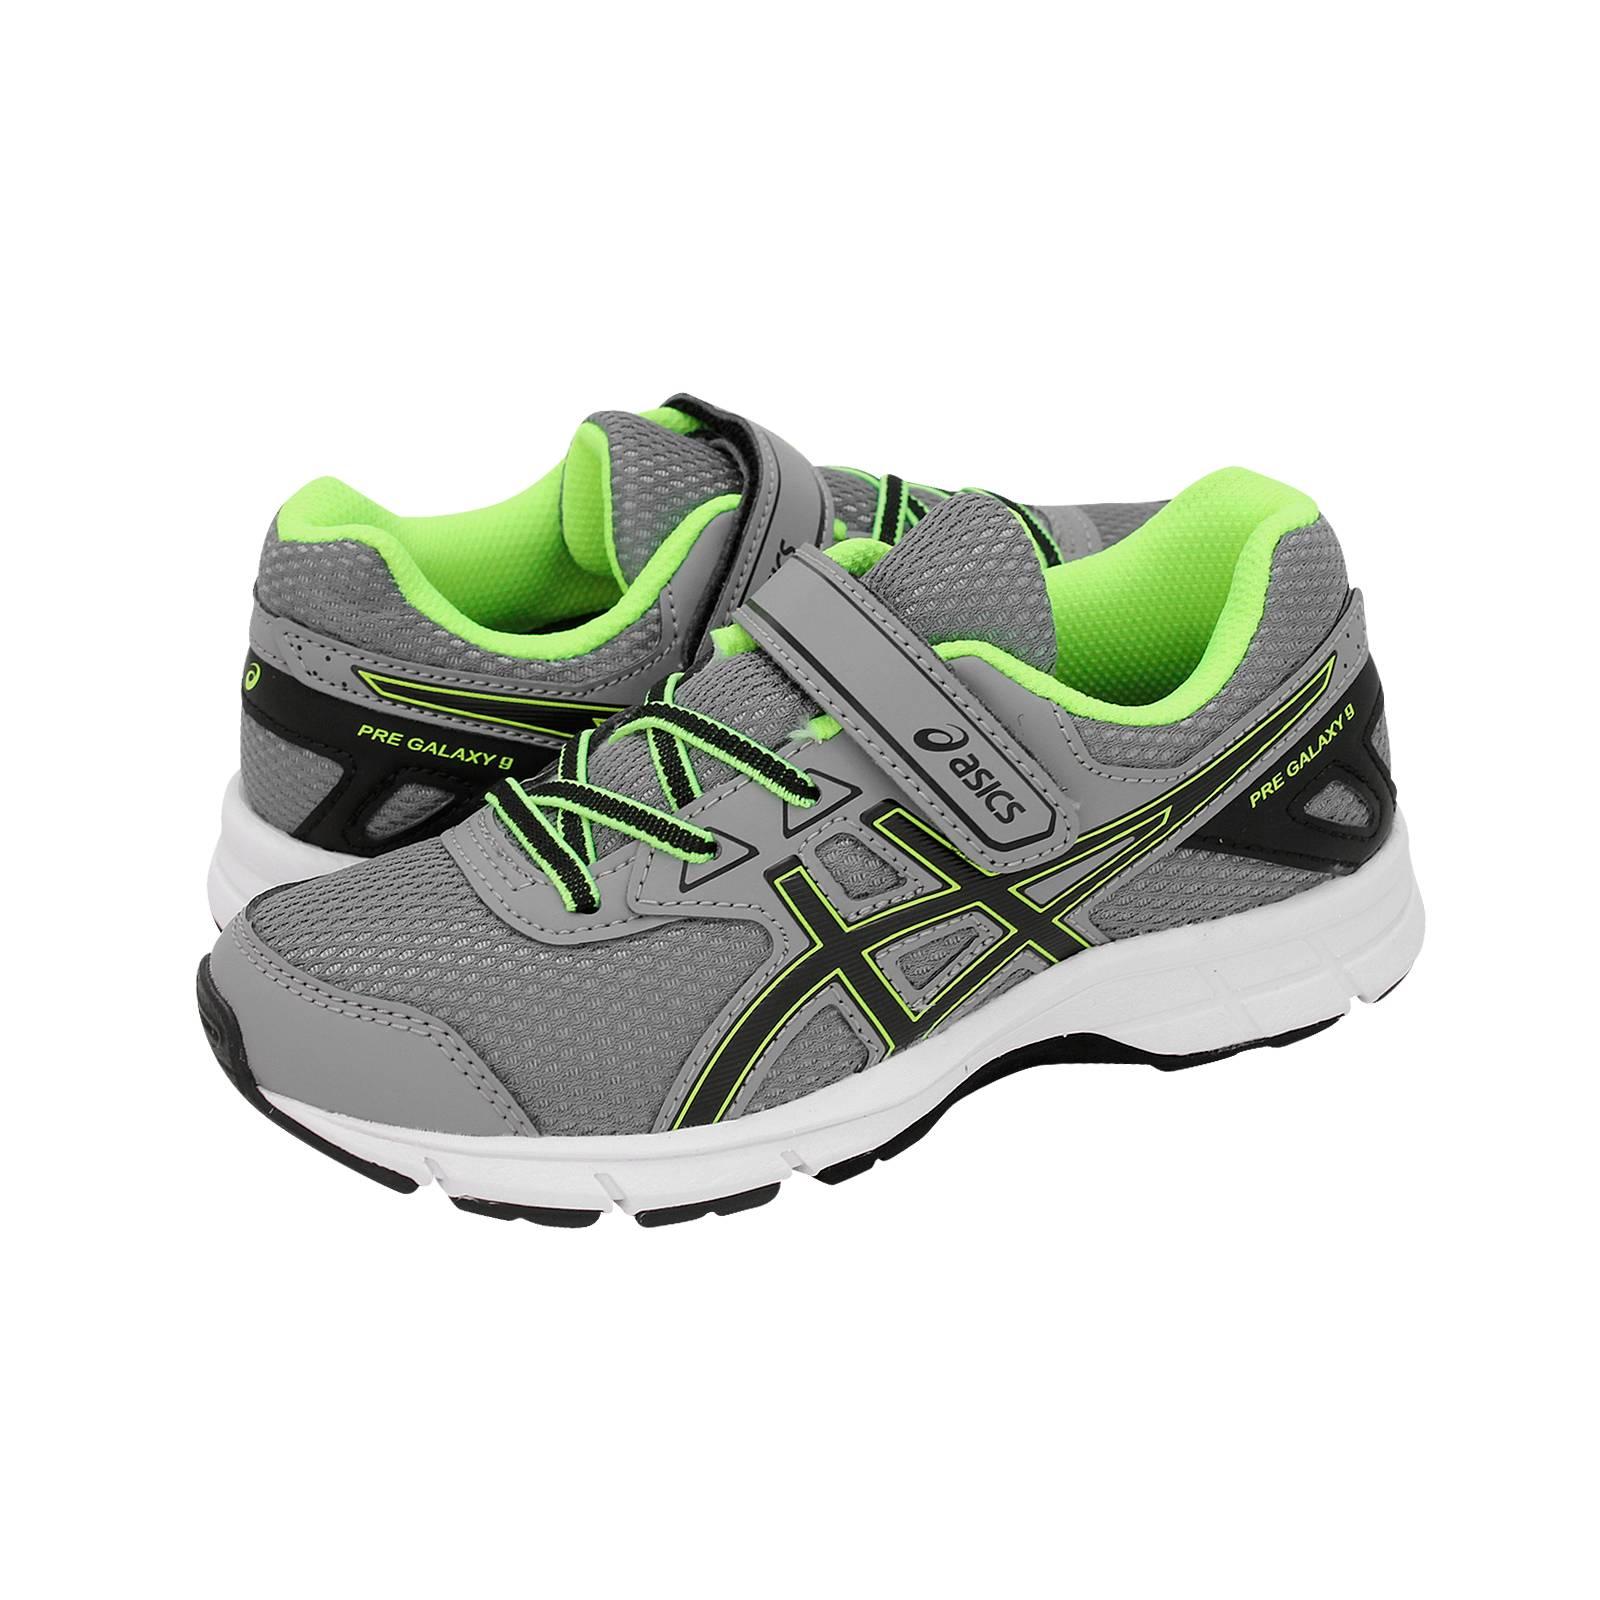 Pre Galaxy 9 PS - Παιδικά αθλητικά παπούτσια Asics από ύφασμα και ... b383154668b